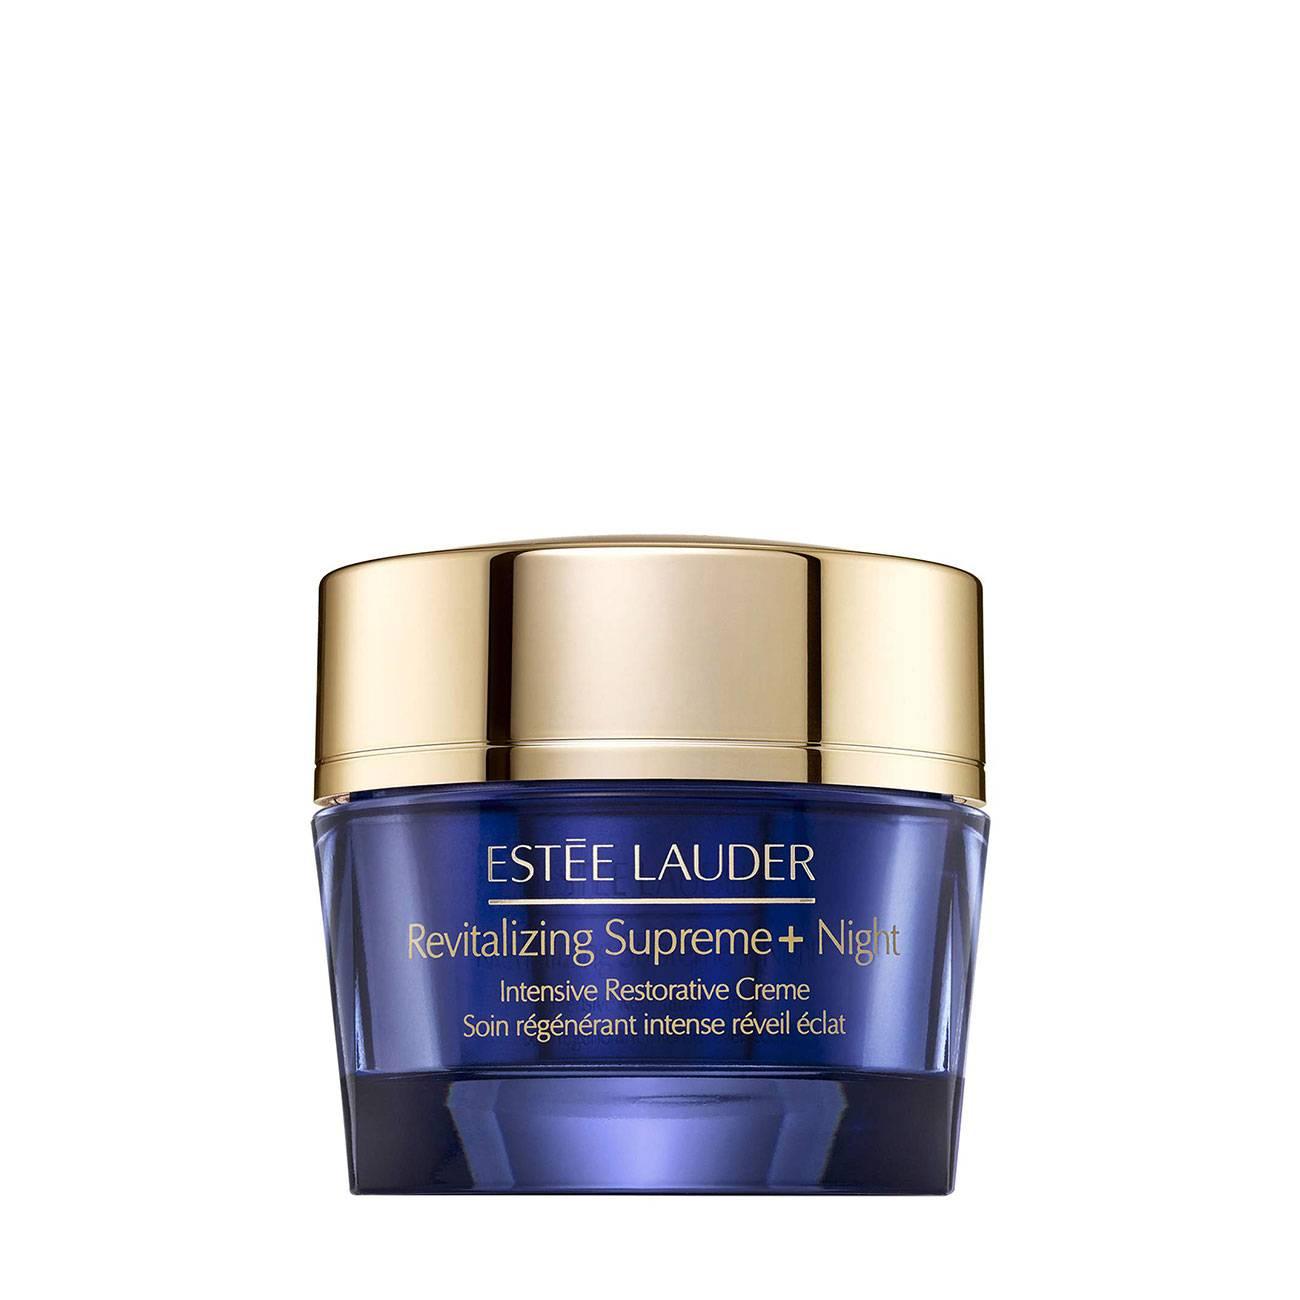 Revitalizing Supreme +night Intensive Restorative Cream Moisturizer 50ml